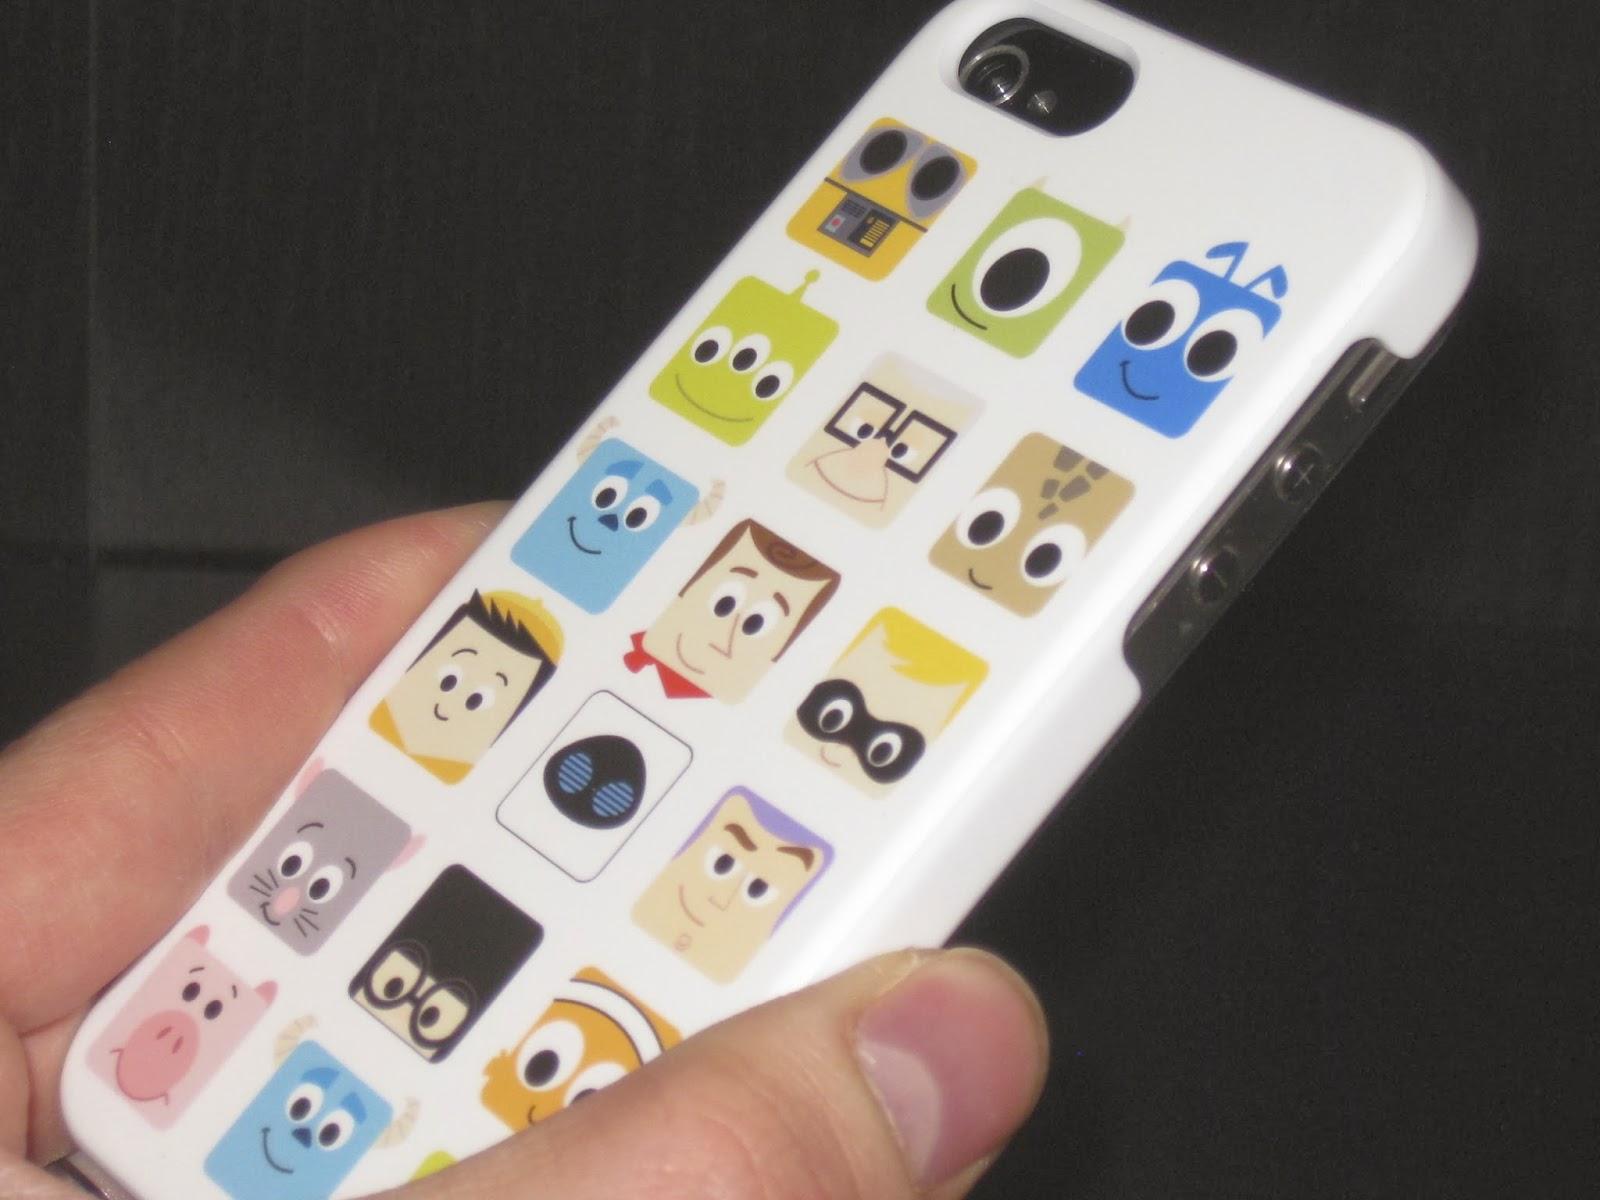 new concept 57eb1 0658a Dan the Pixar Fan: Pixar Collection: iPhone Case